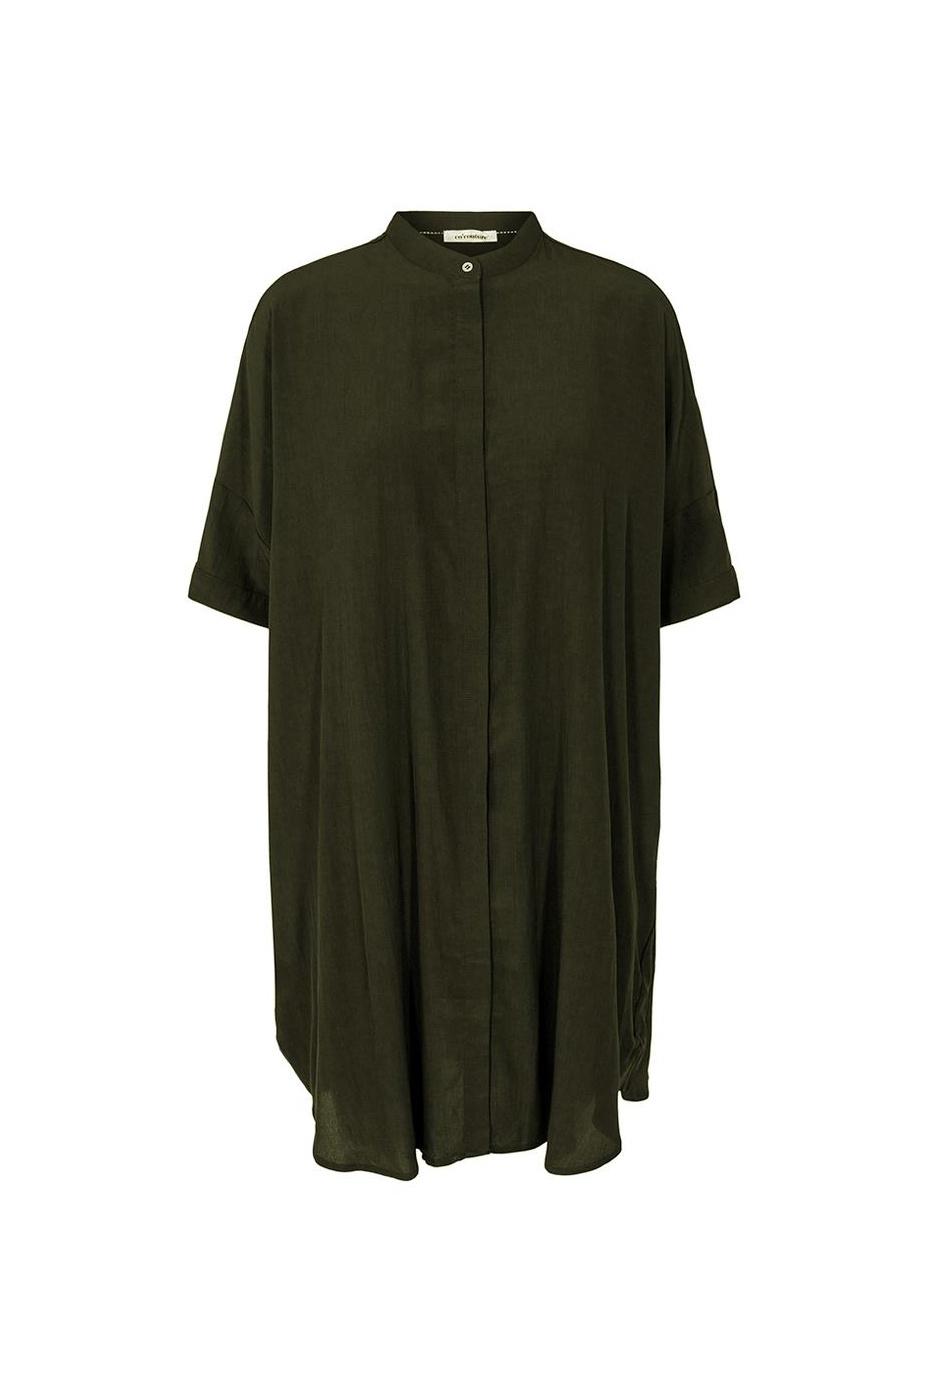 Sunrise Tunic Shirt - Dark Army-1